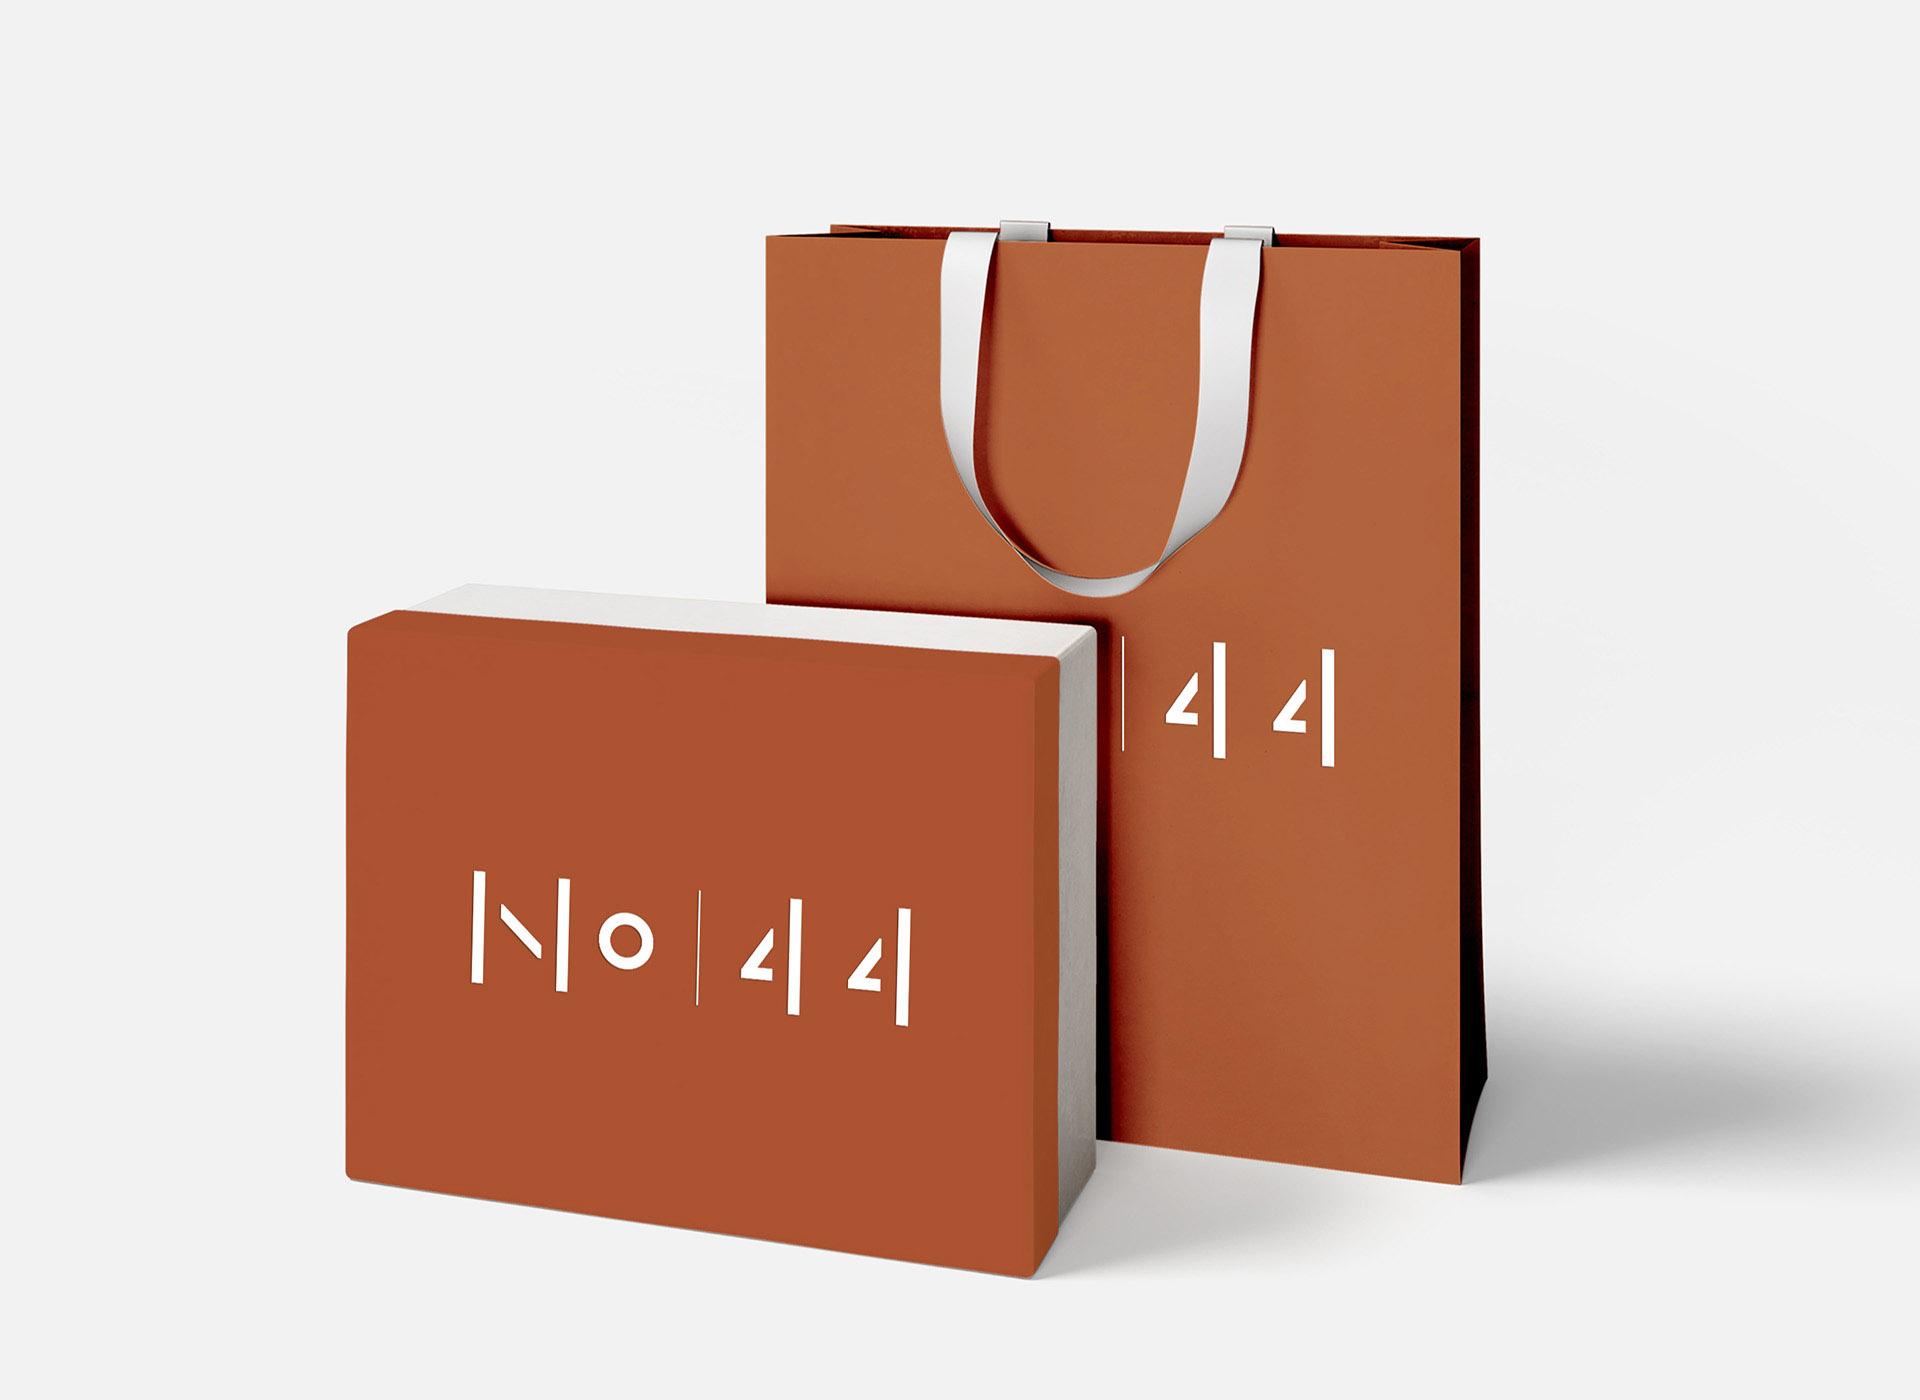 NO44 portofoliu inoveo bags